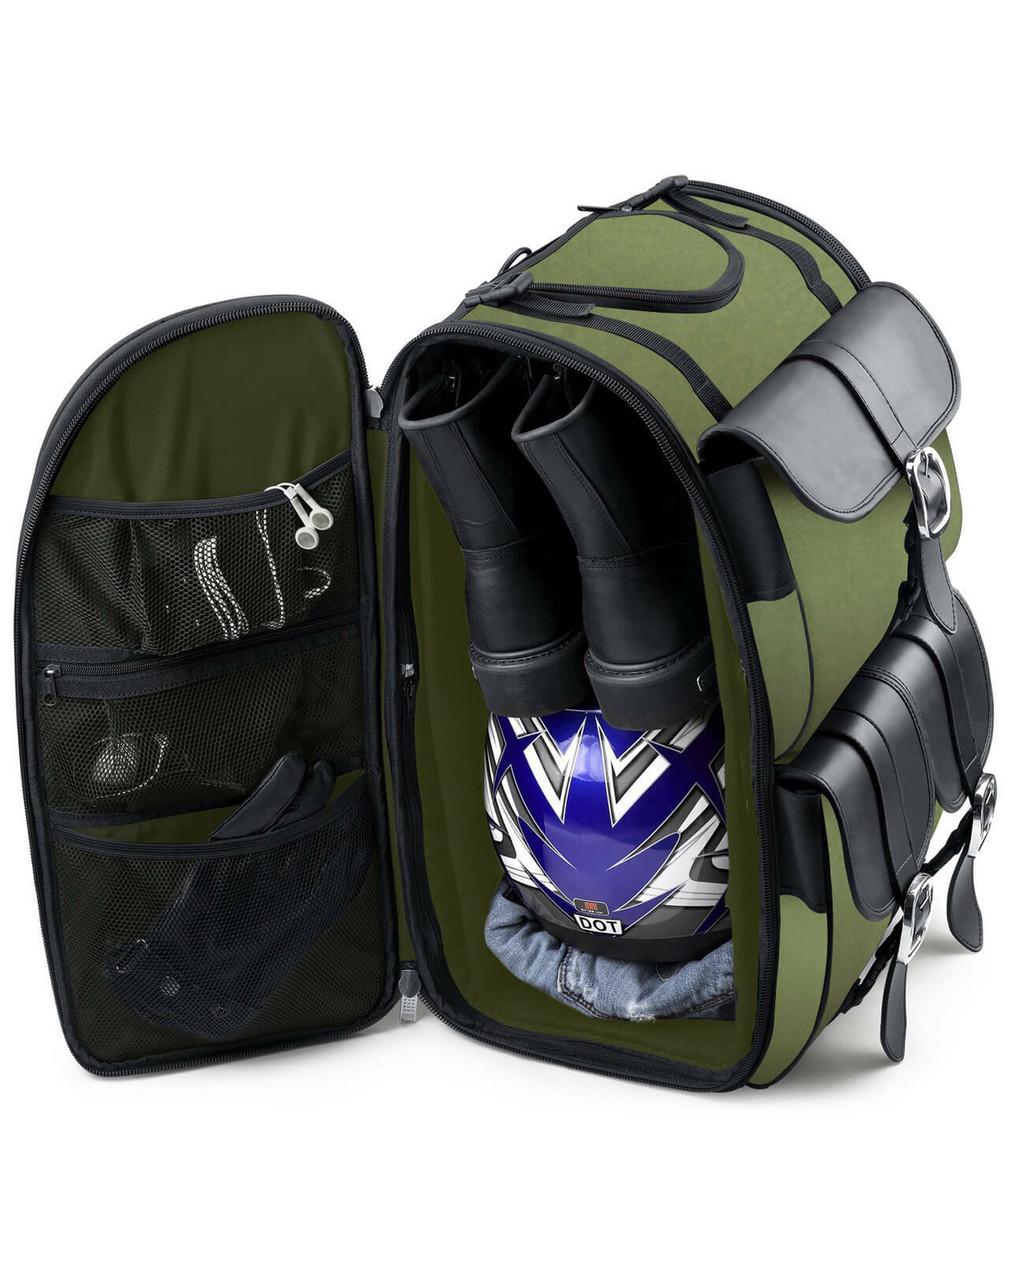 Honda Viking Extra Large Plain Green Motorcycle Sissy Bar Bag Storage View